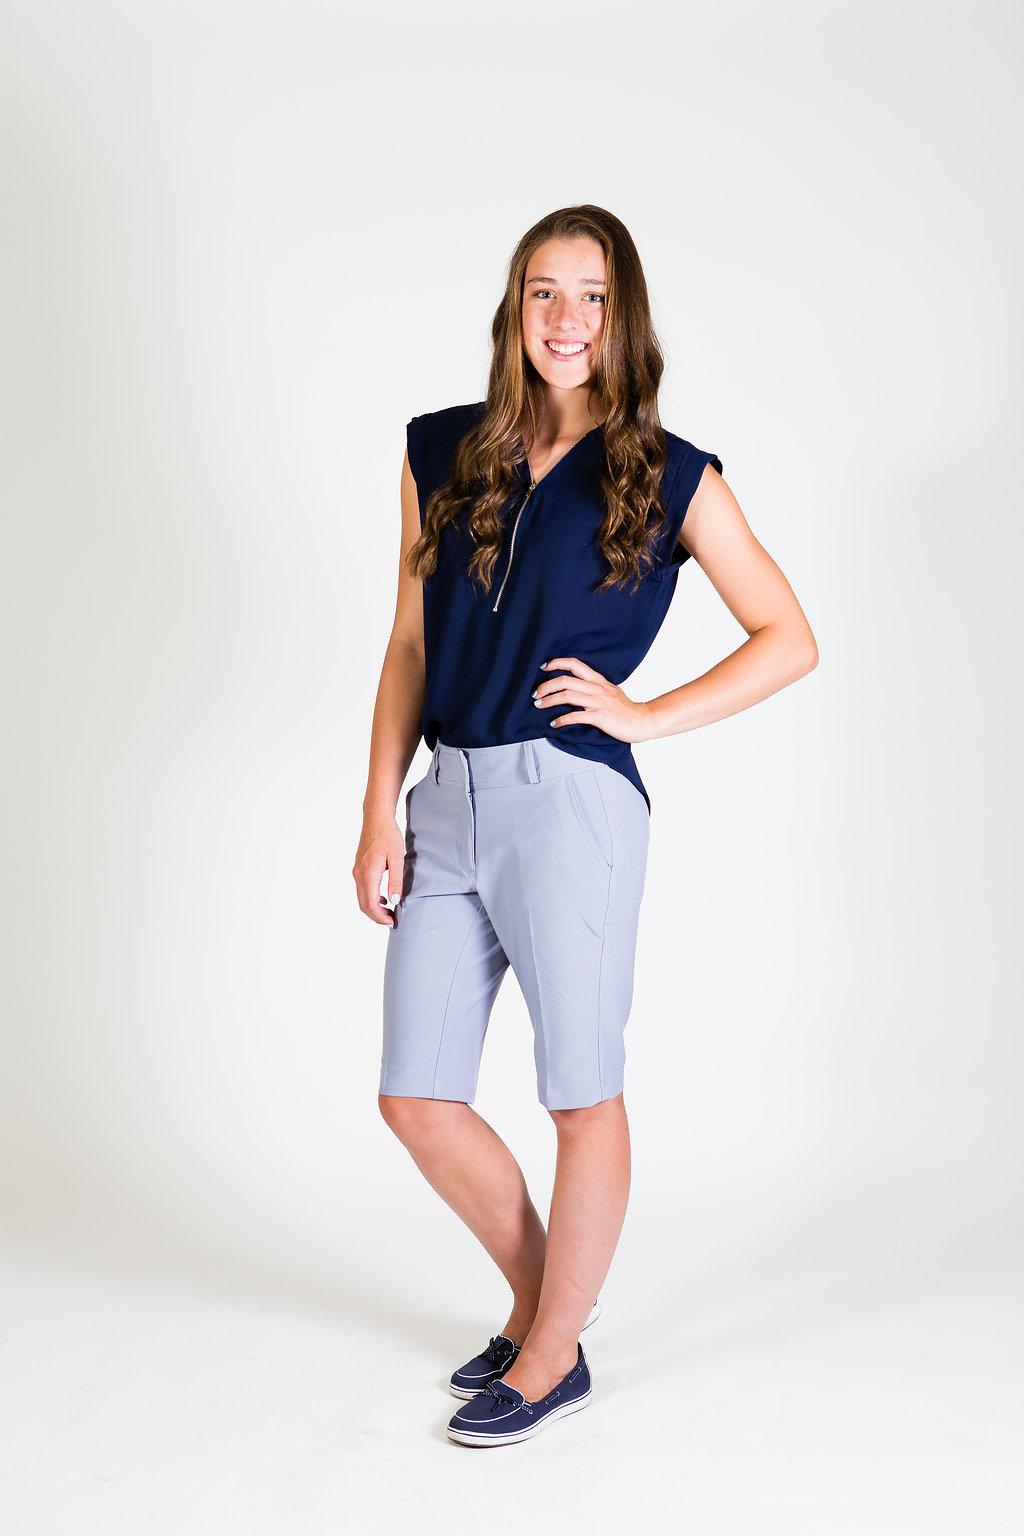 16JuneWCA_Uniforms146-Edit.jpg